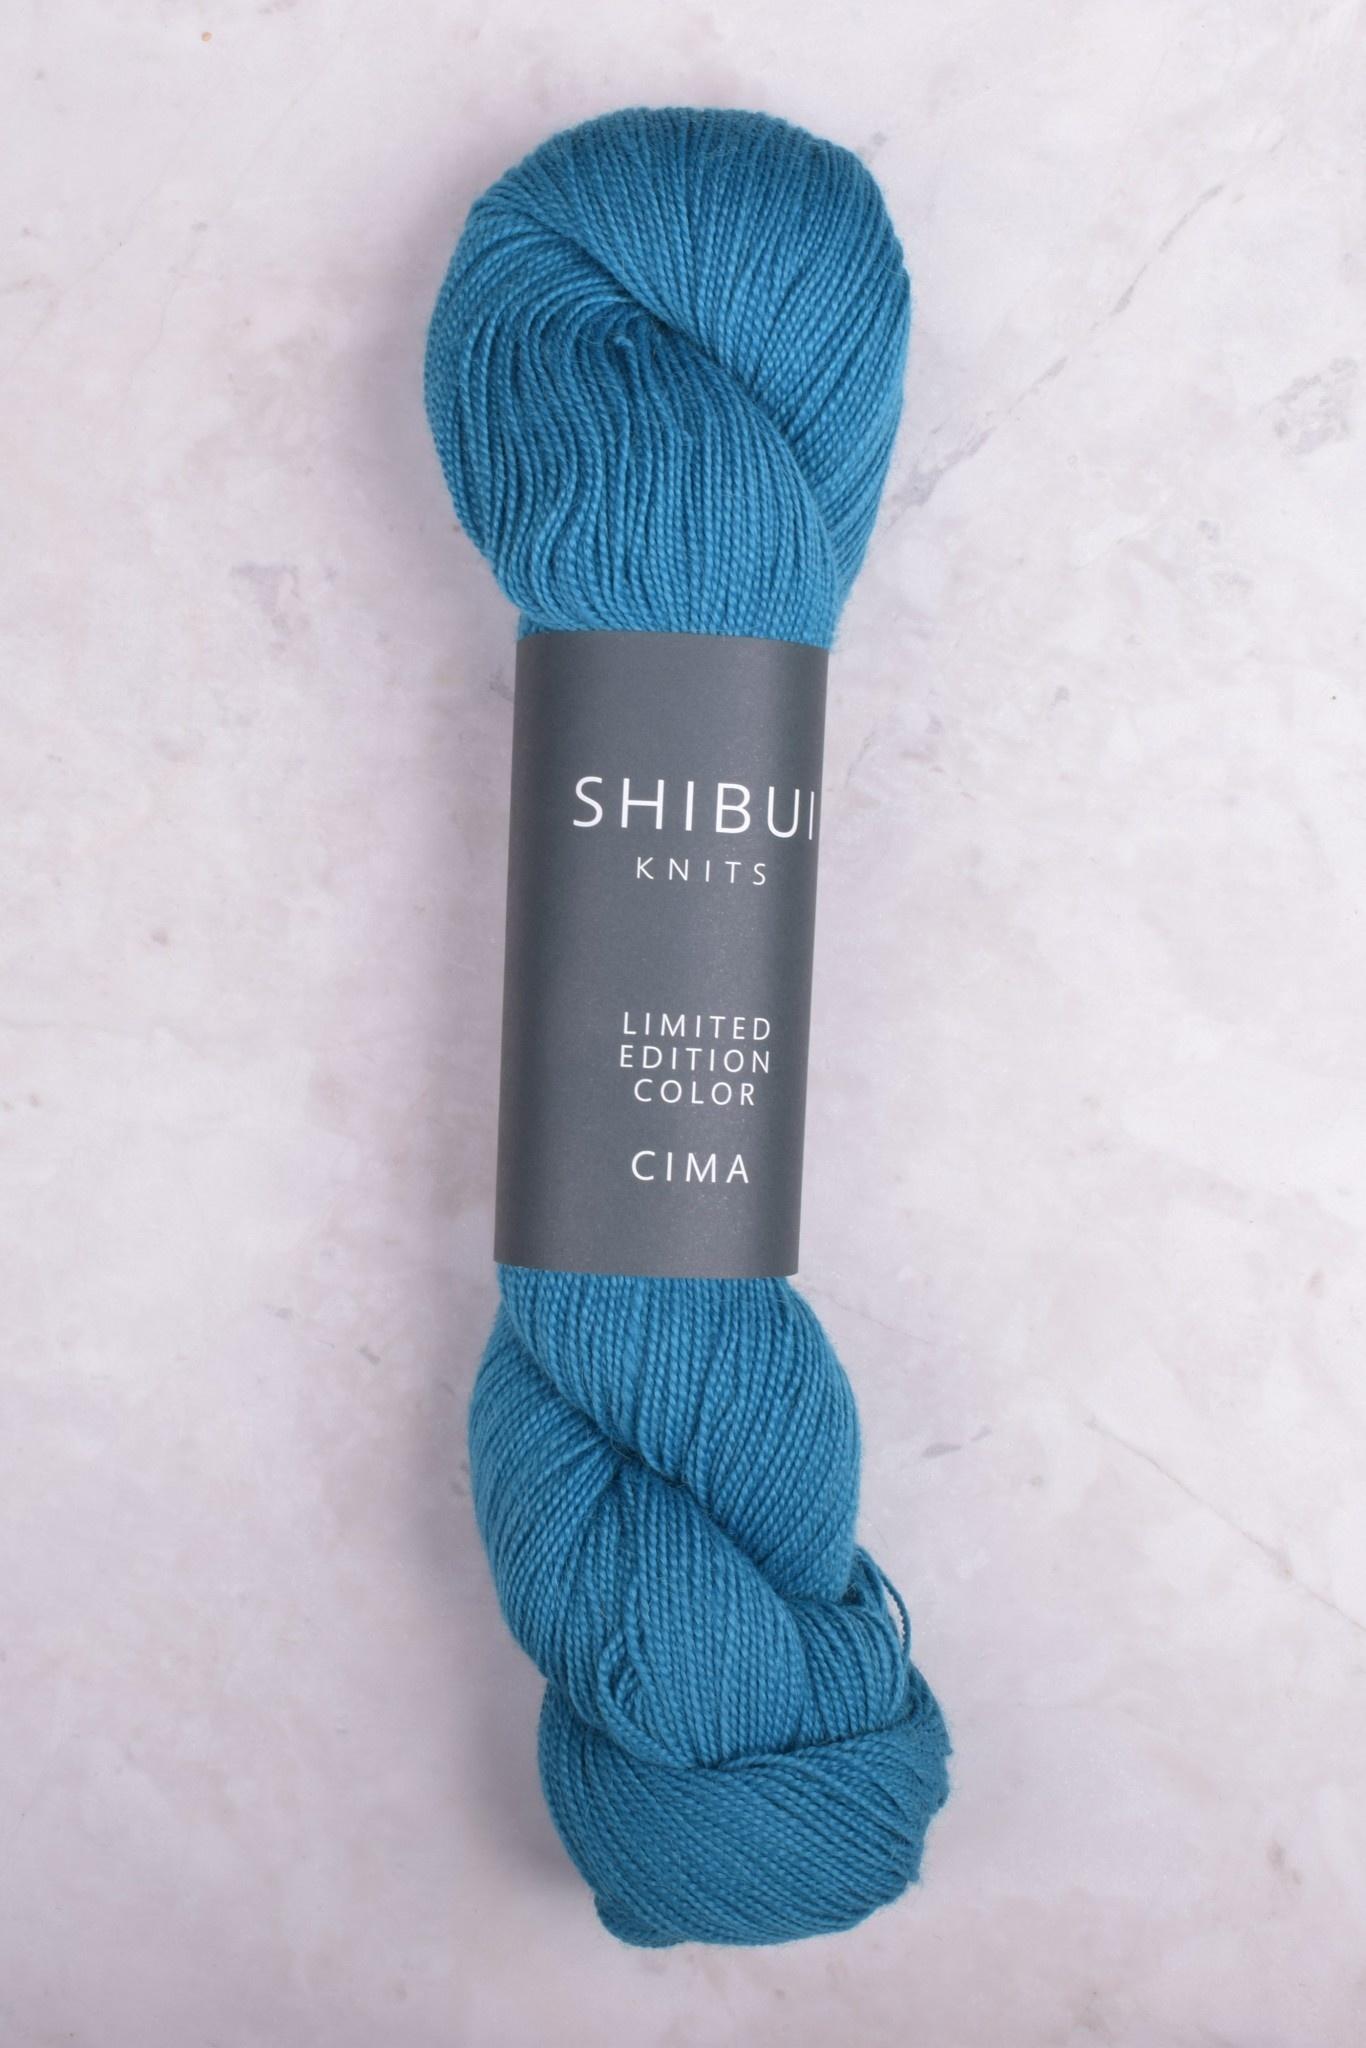 Image of Shibui Cima 2196 Riviera (Limited Edition)